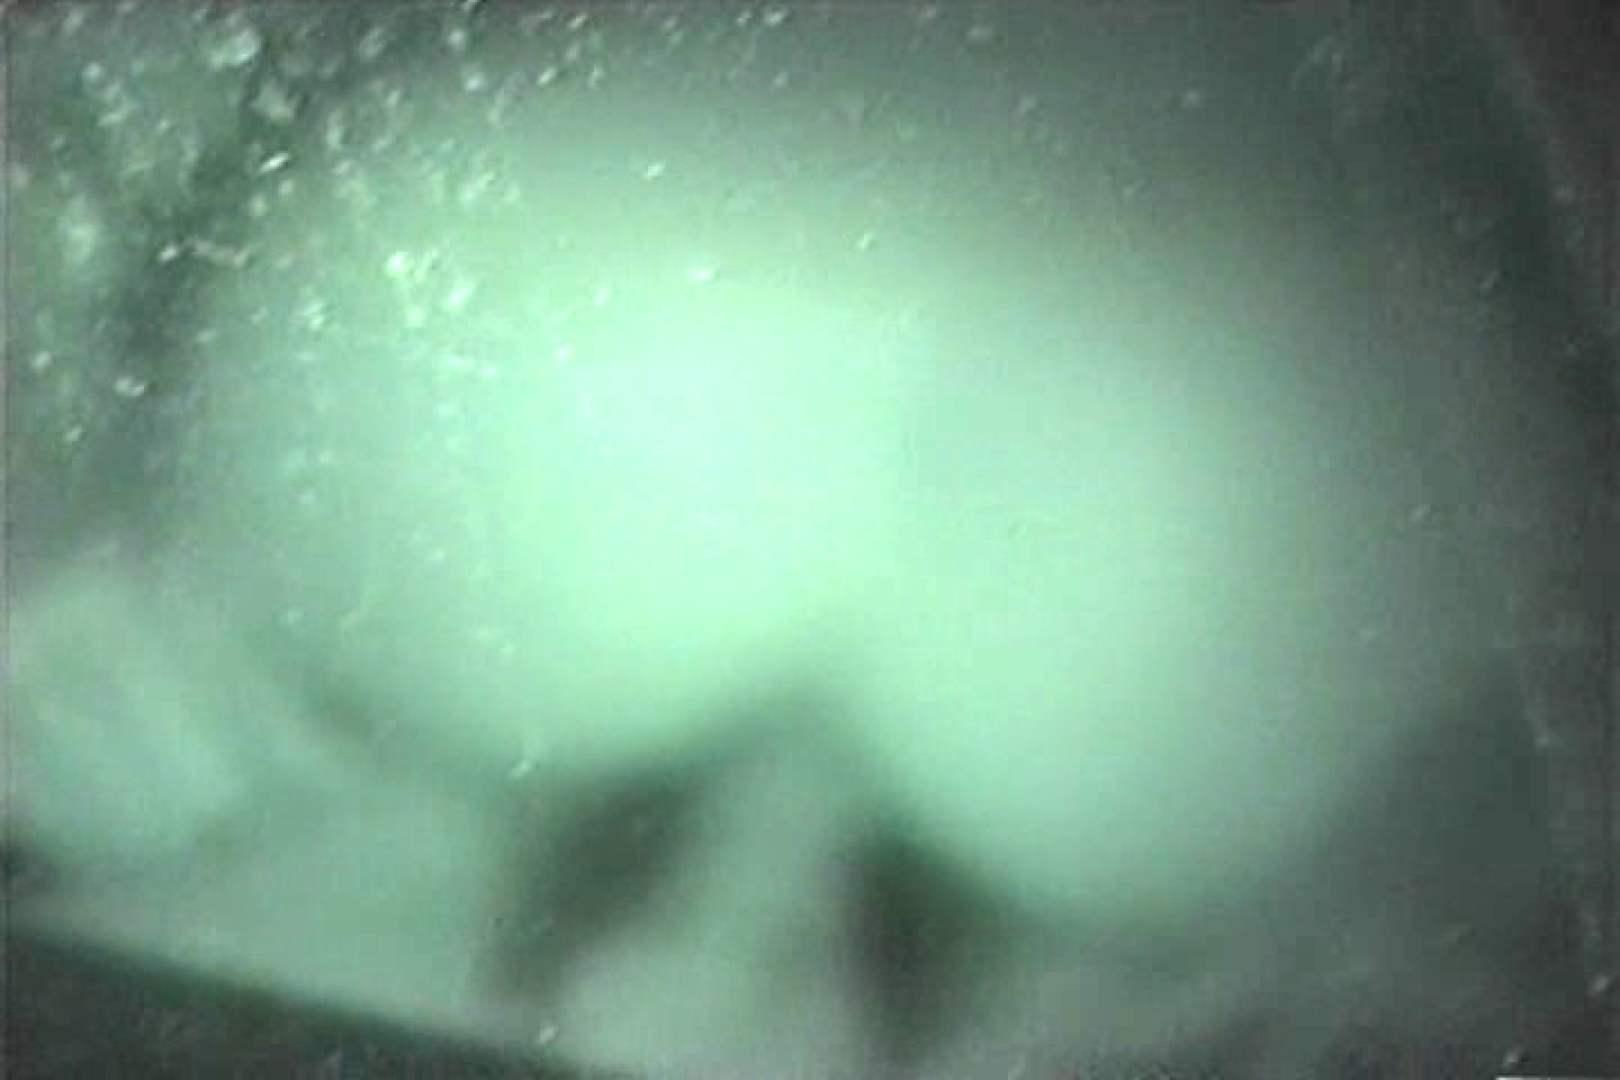 MASAさんの待ち伏せ撮り! 赤外線カーセックスVol.18 OLエロ画像 盗み撮りAV無料動画キャプチャ 64PICs 57